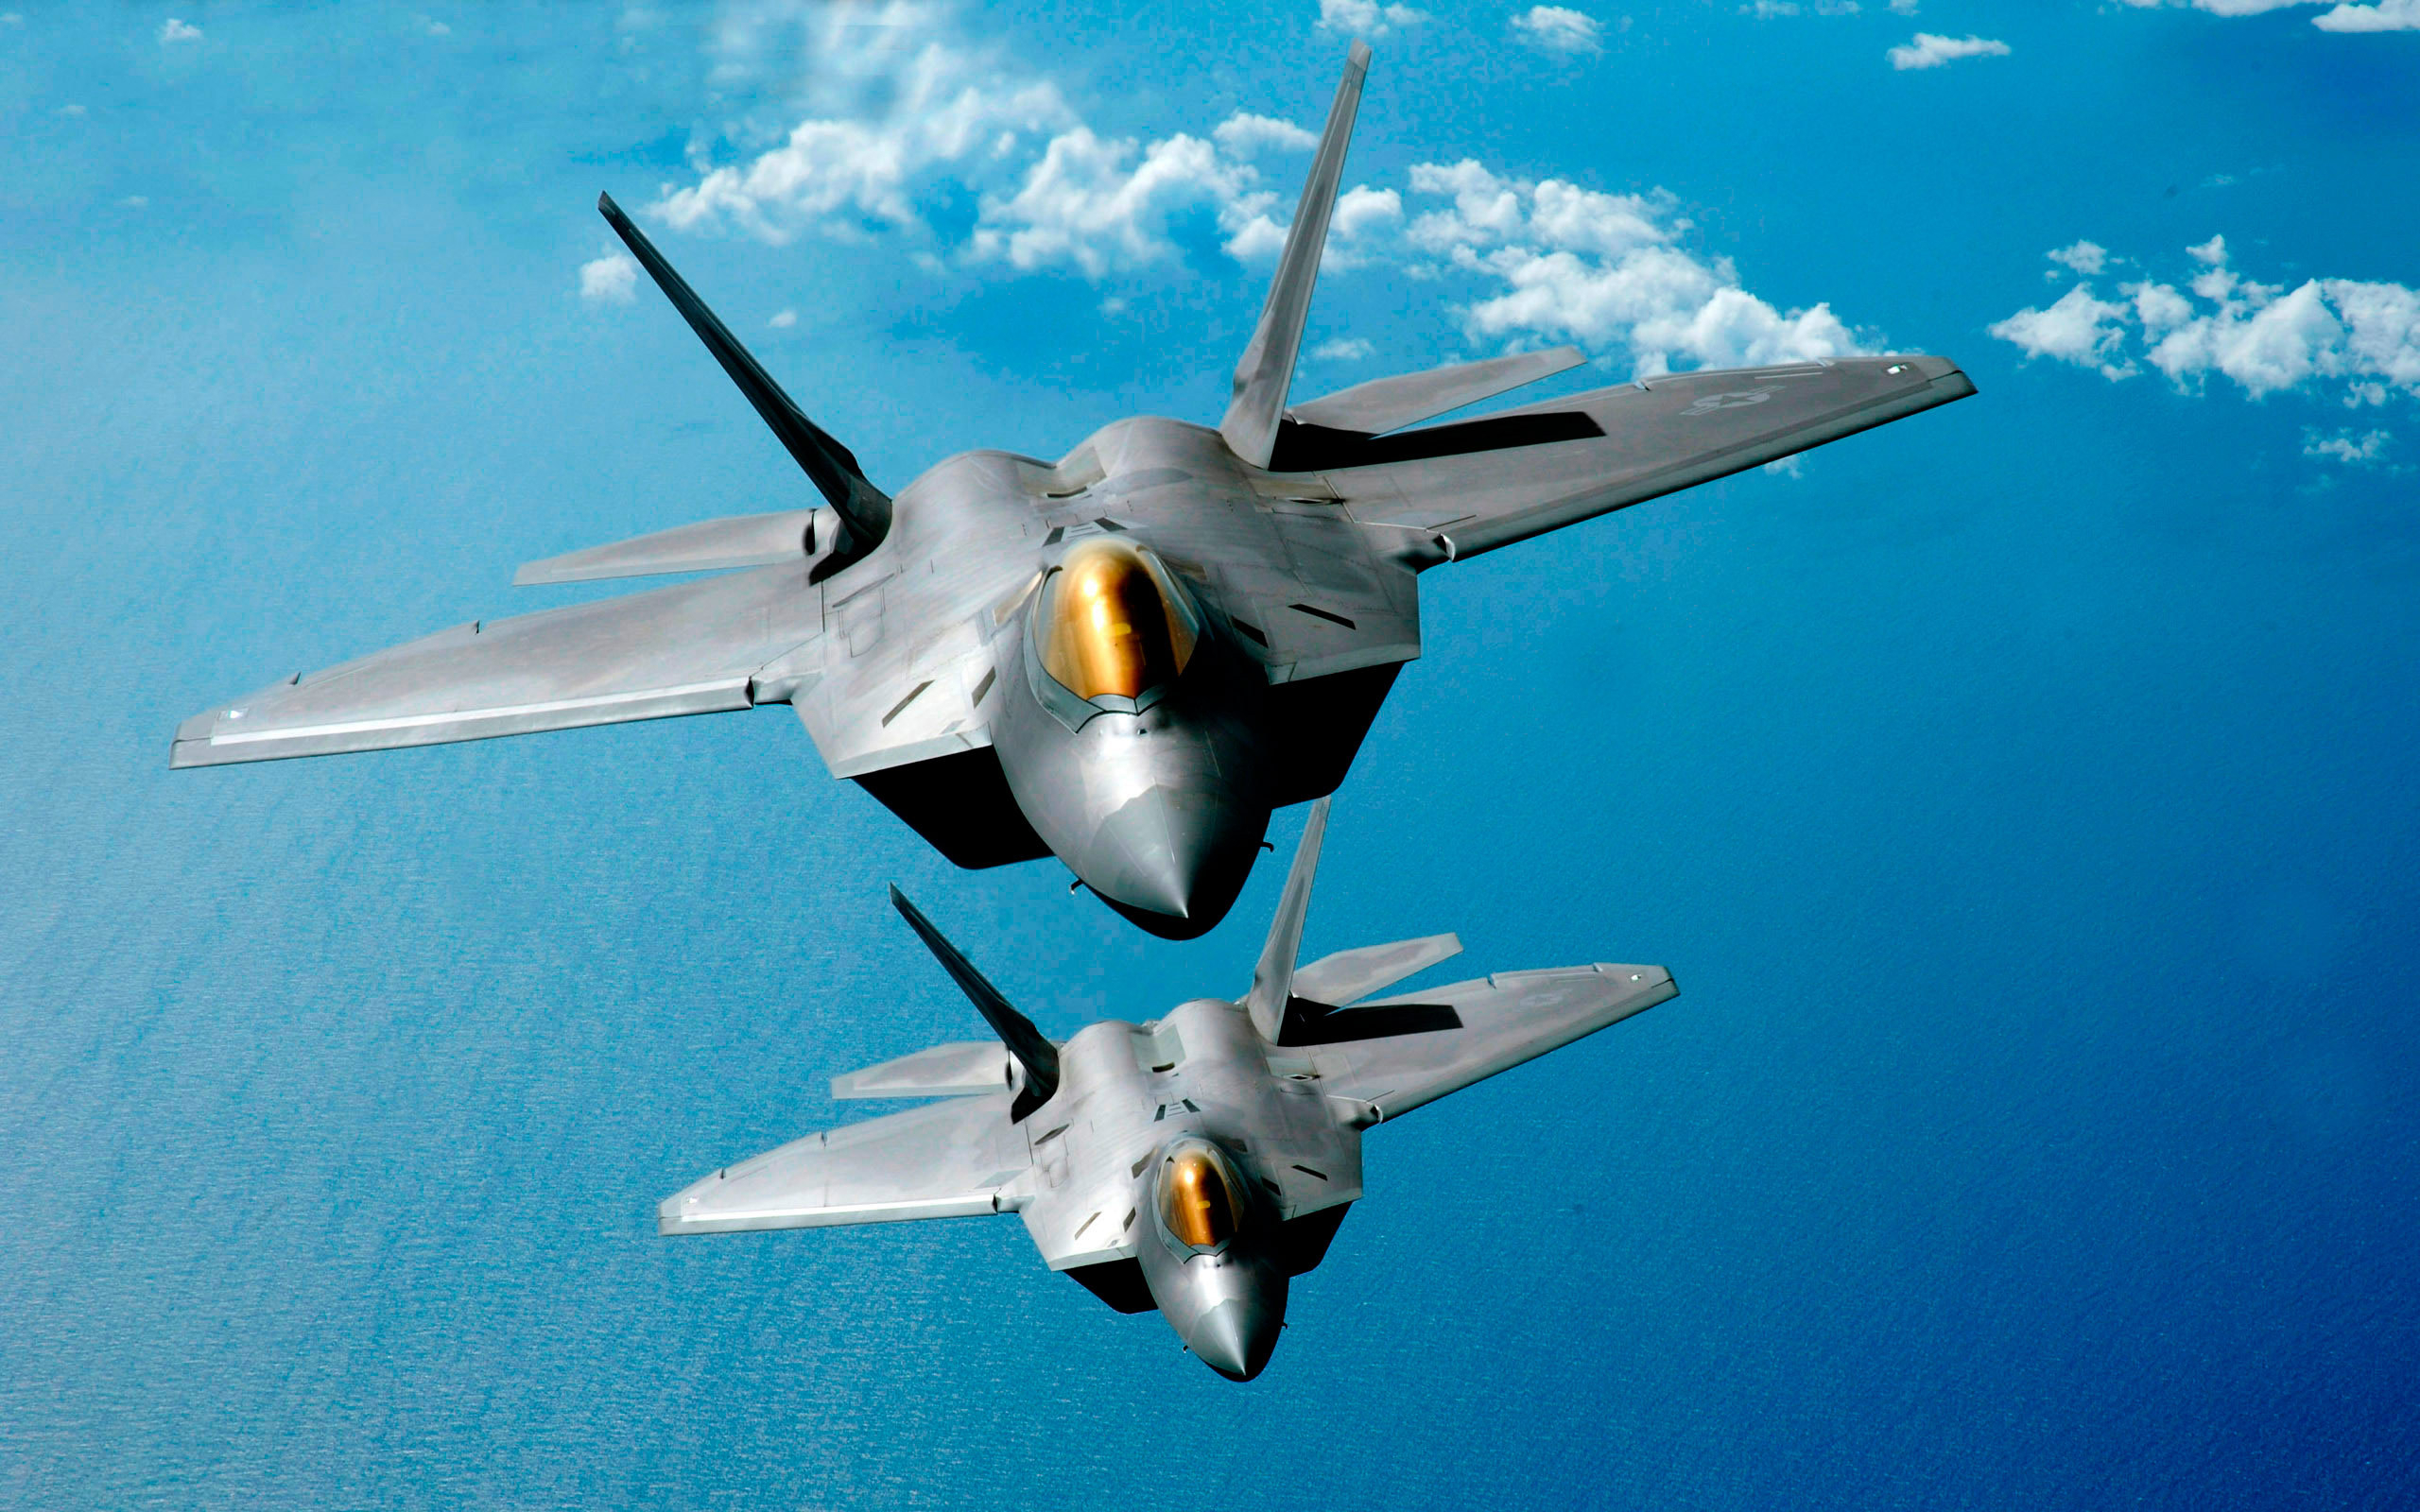 wallpaper lockheed martin f-22 raptor, stealth fighters, hd